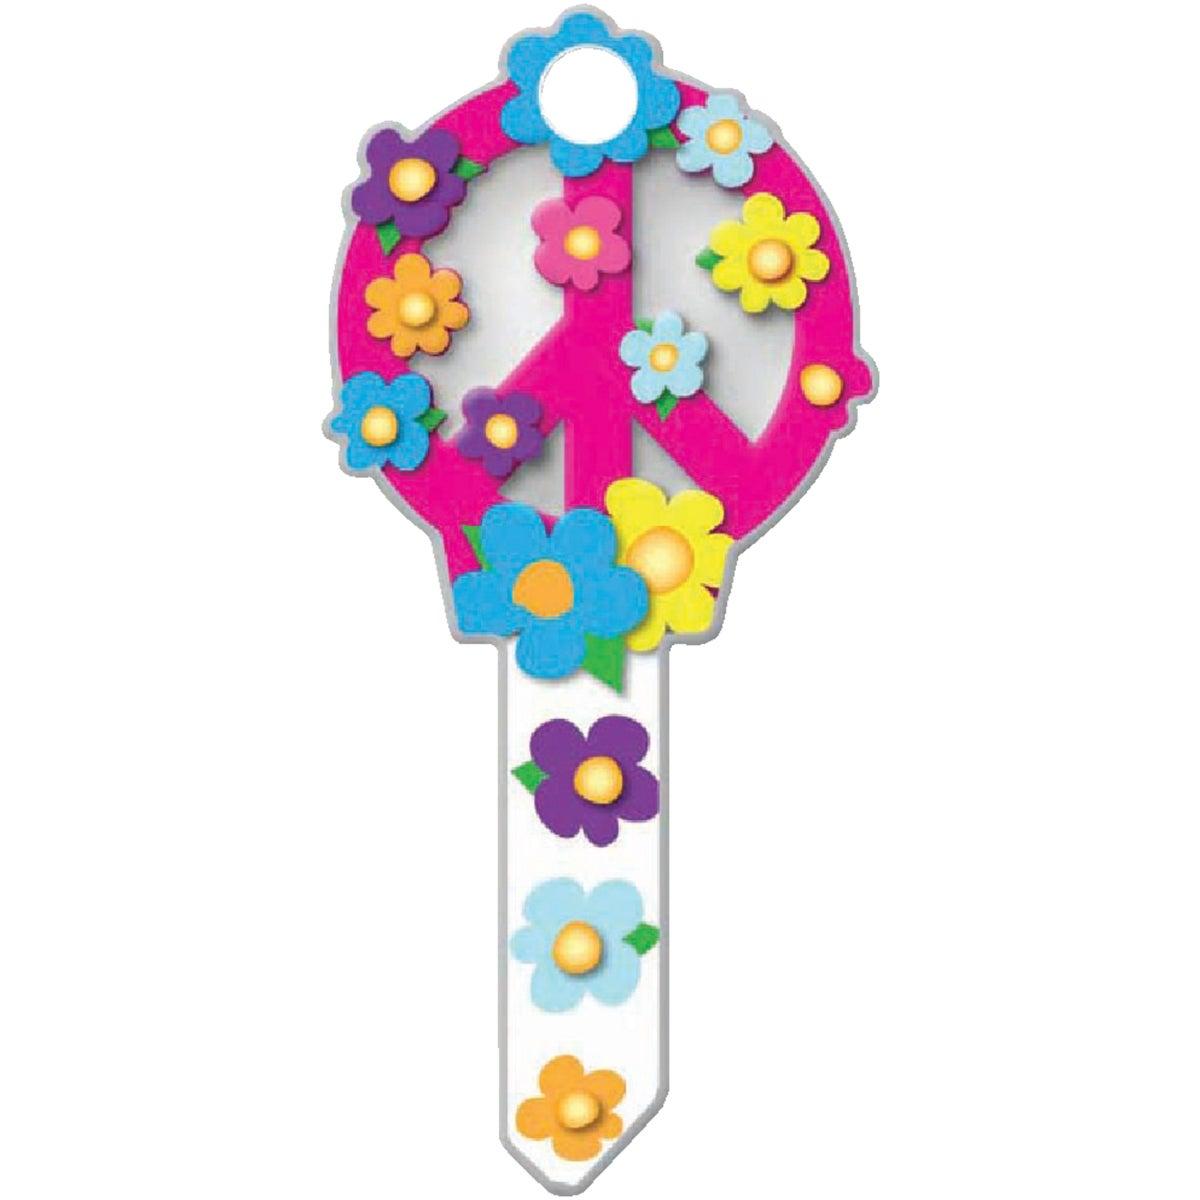 SC1 PEACE SIGN DOOR KEY - B104S by Lucky Line Prod Inc